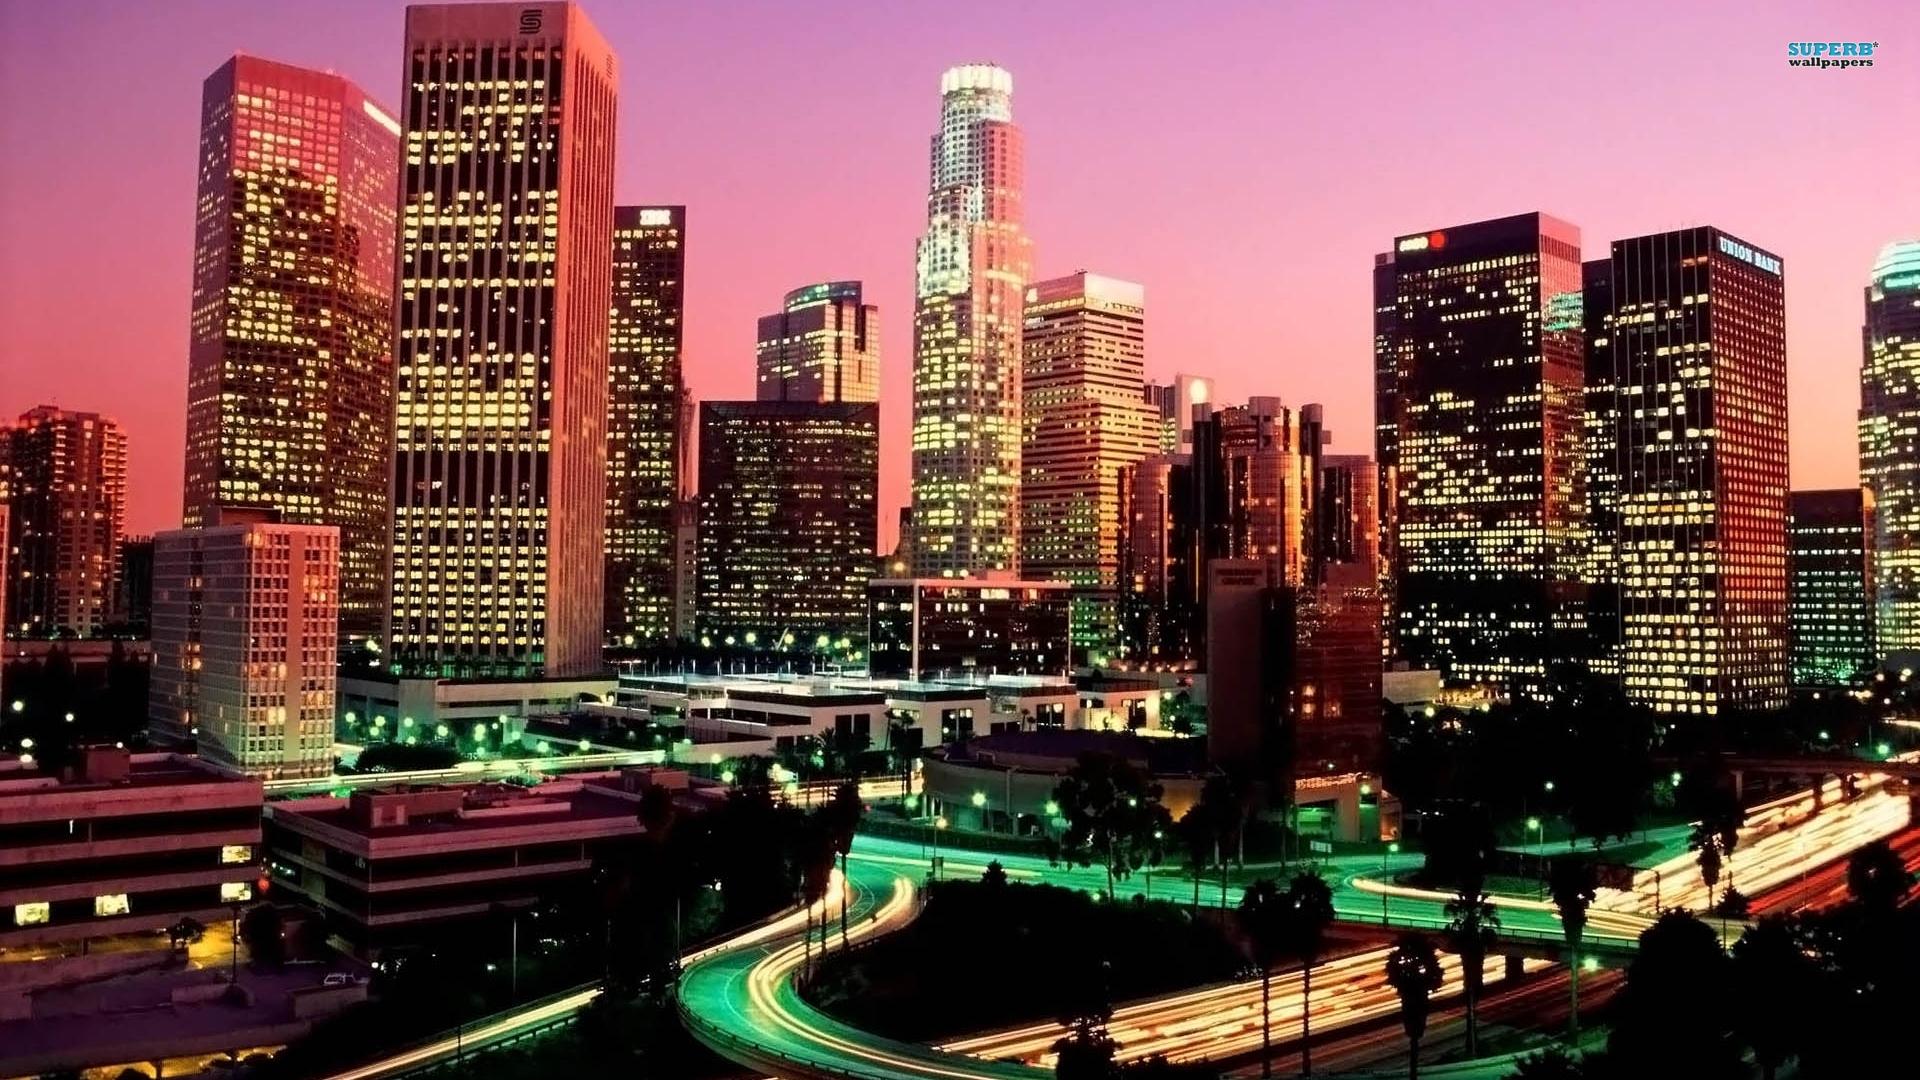 Los Angeles wallpaper 1920x1080 jpg